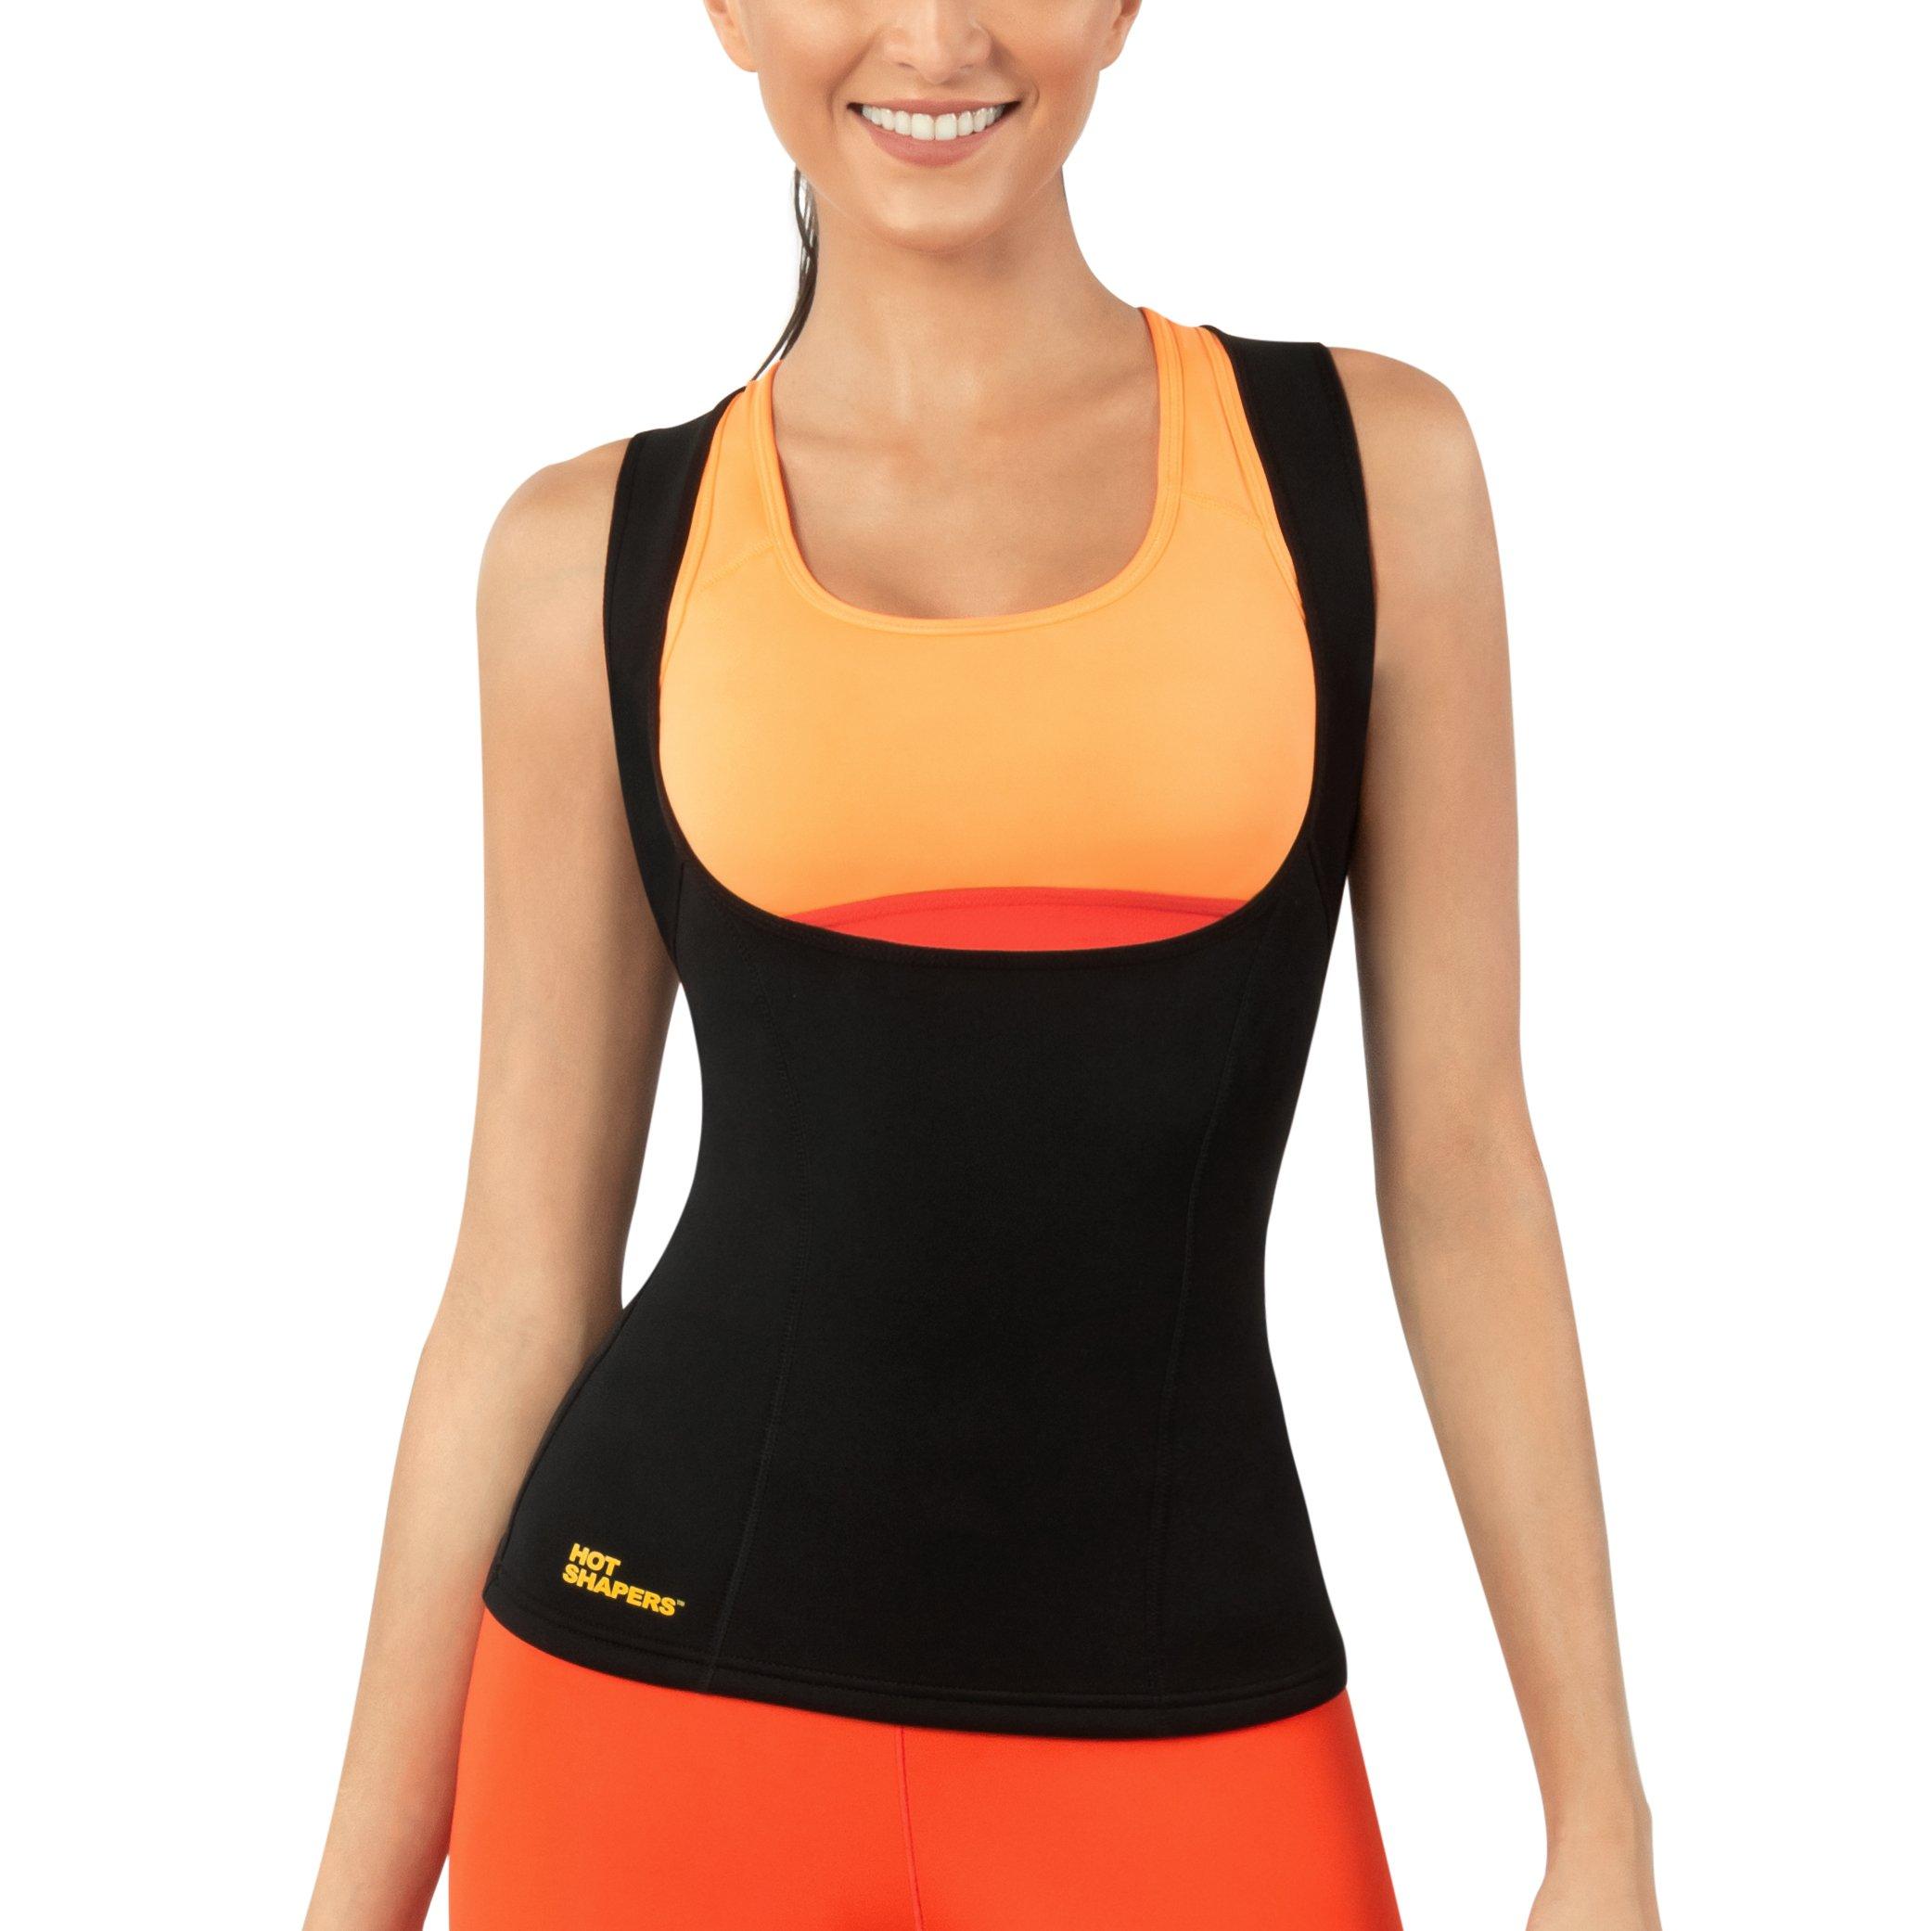 Amazon.com : Hot Shapers Slimming Gel - Anti-Cellulite